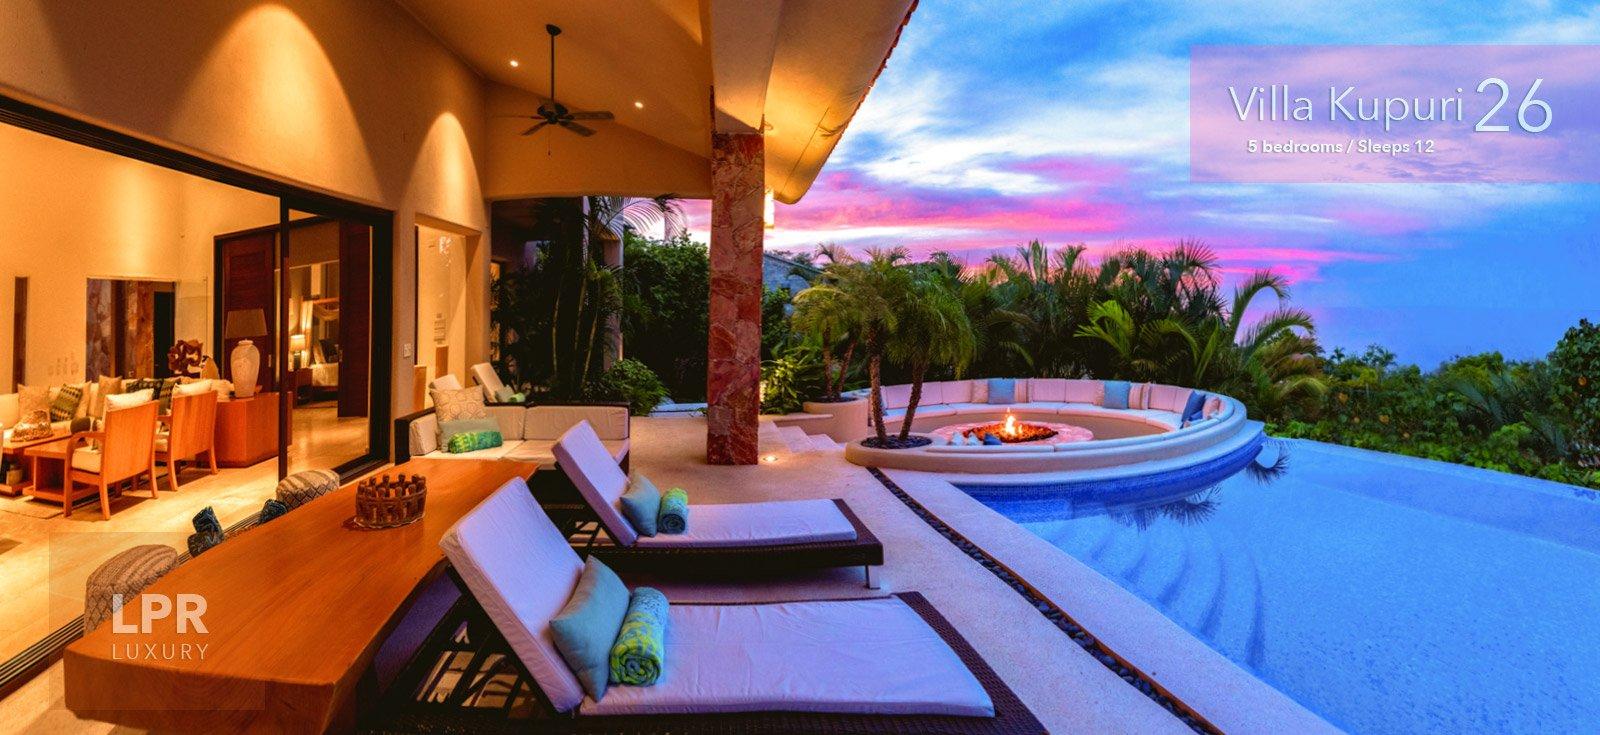 Villa Kupuri 26 - Punta Mita Resort Real Estate and Vacation Rentals